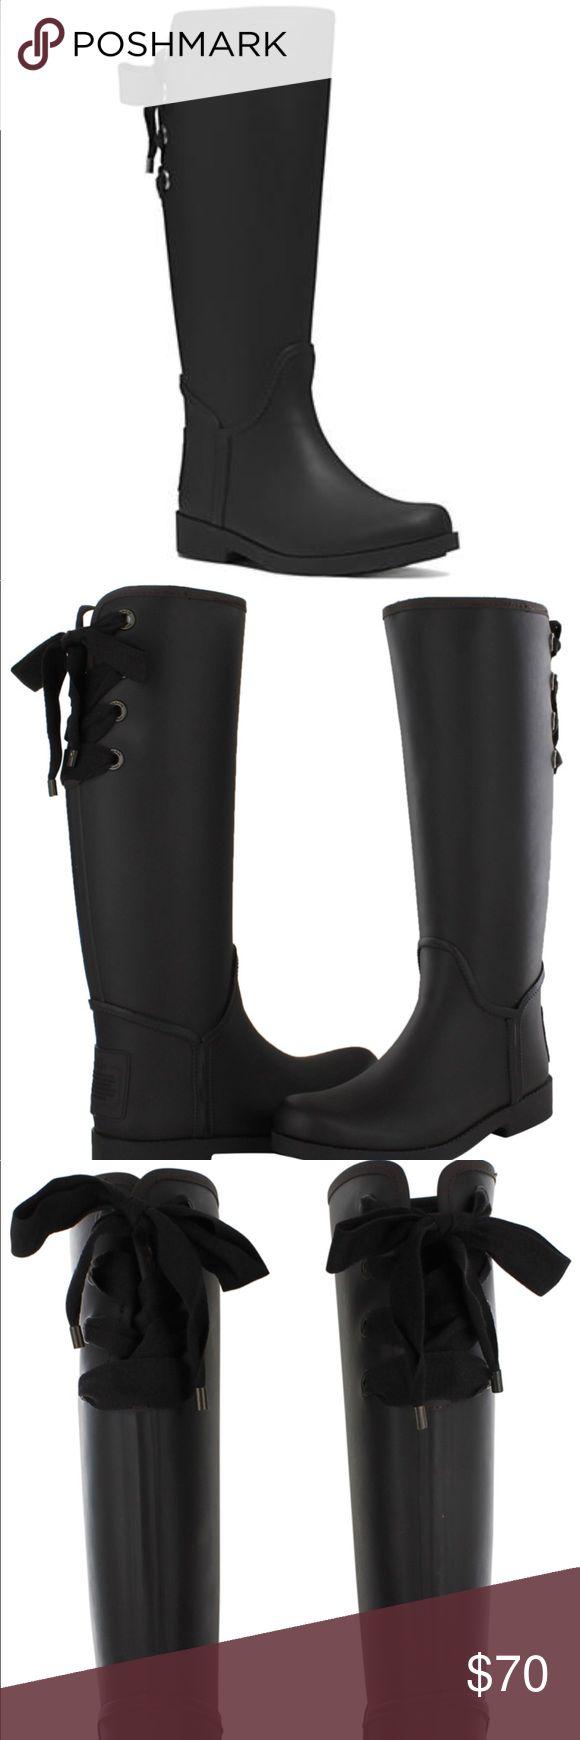 Coach black matte rubber rain boots new Authentic, brand new. Lace up back. Black matte with soft fleece lining the inside. Super cute! Coach Shoes Winter & Rain Boots